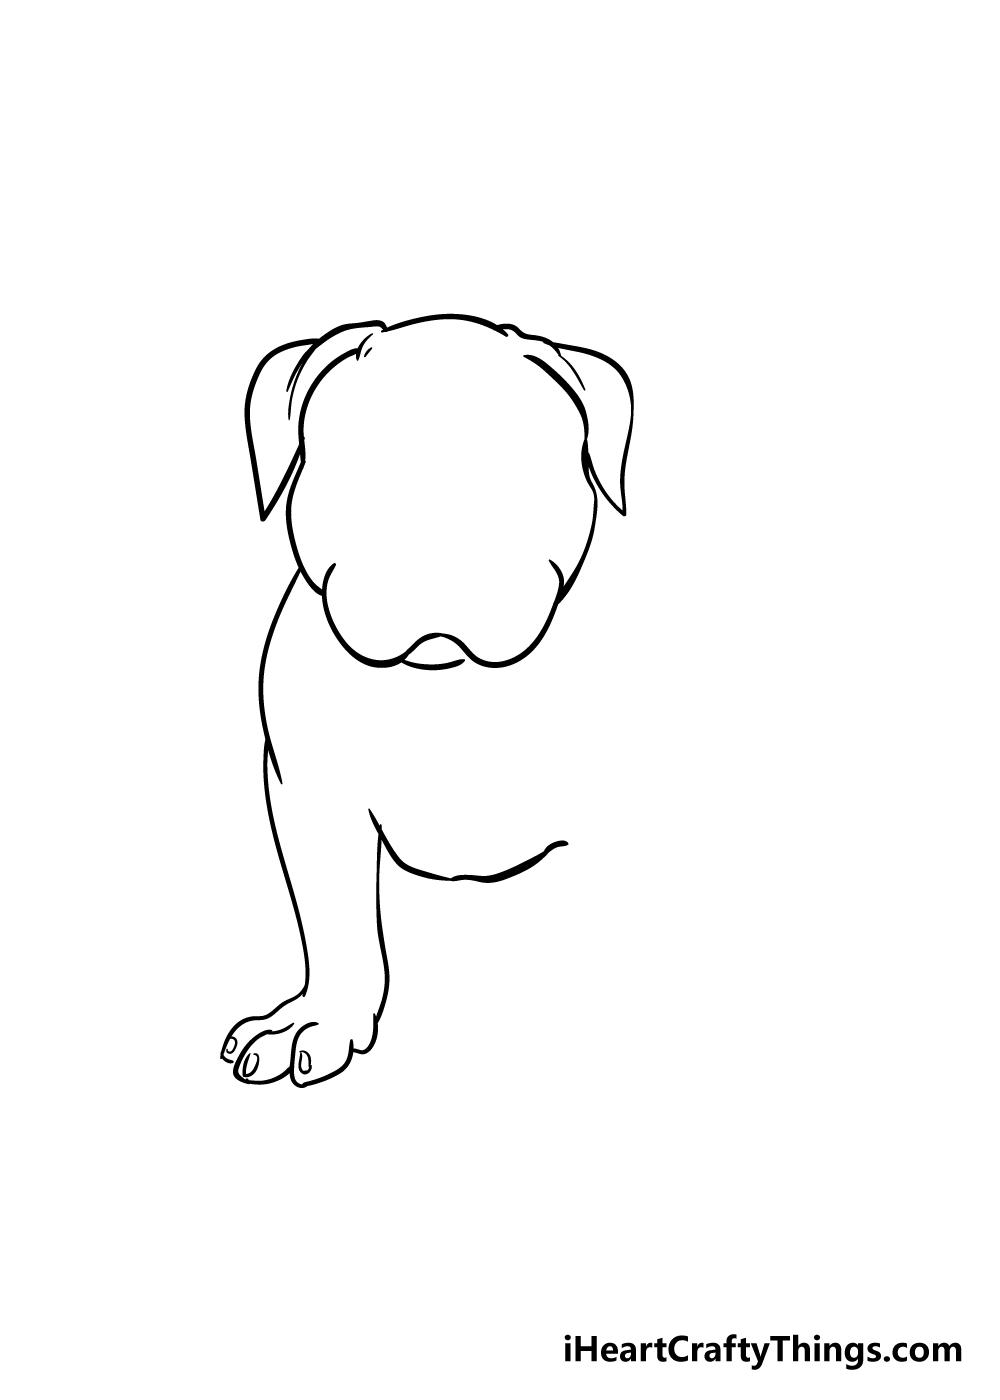 pitbull drawing step 3